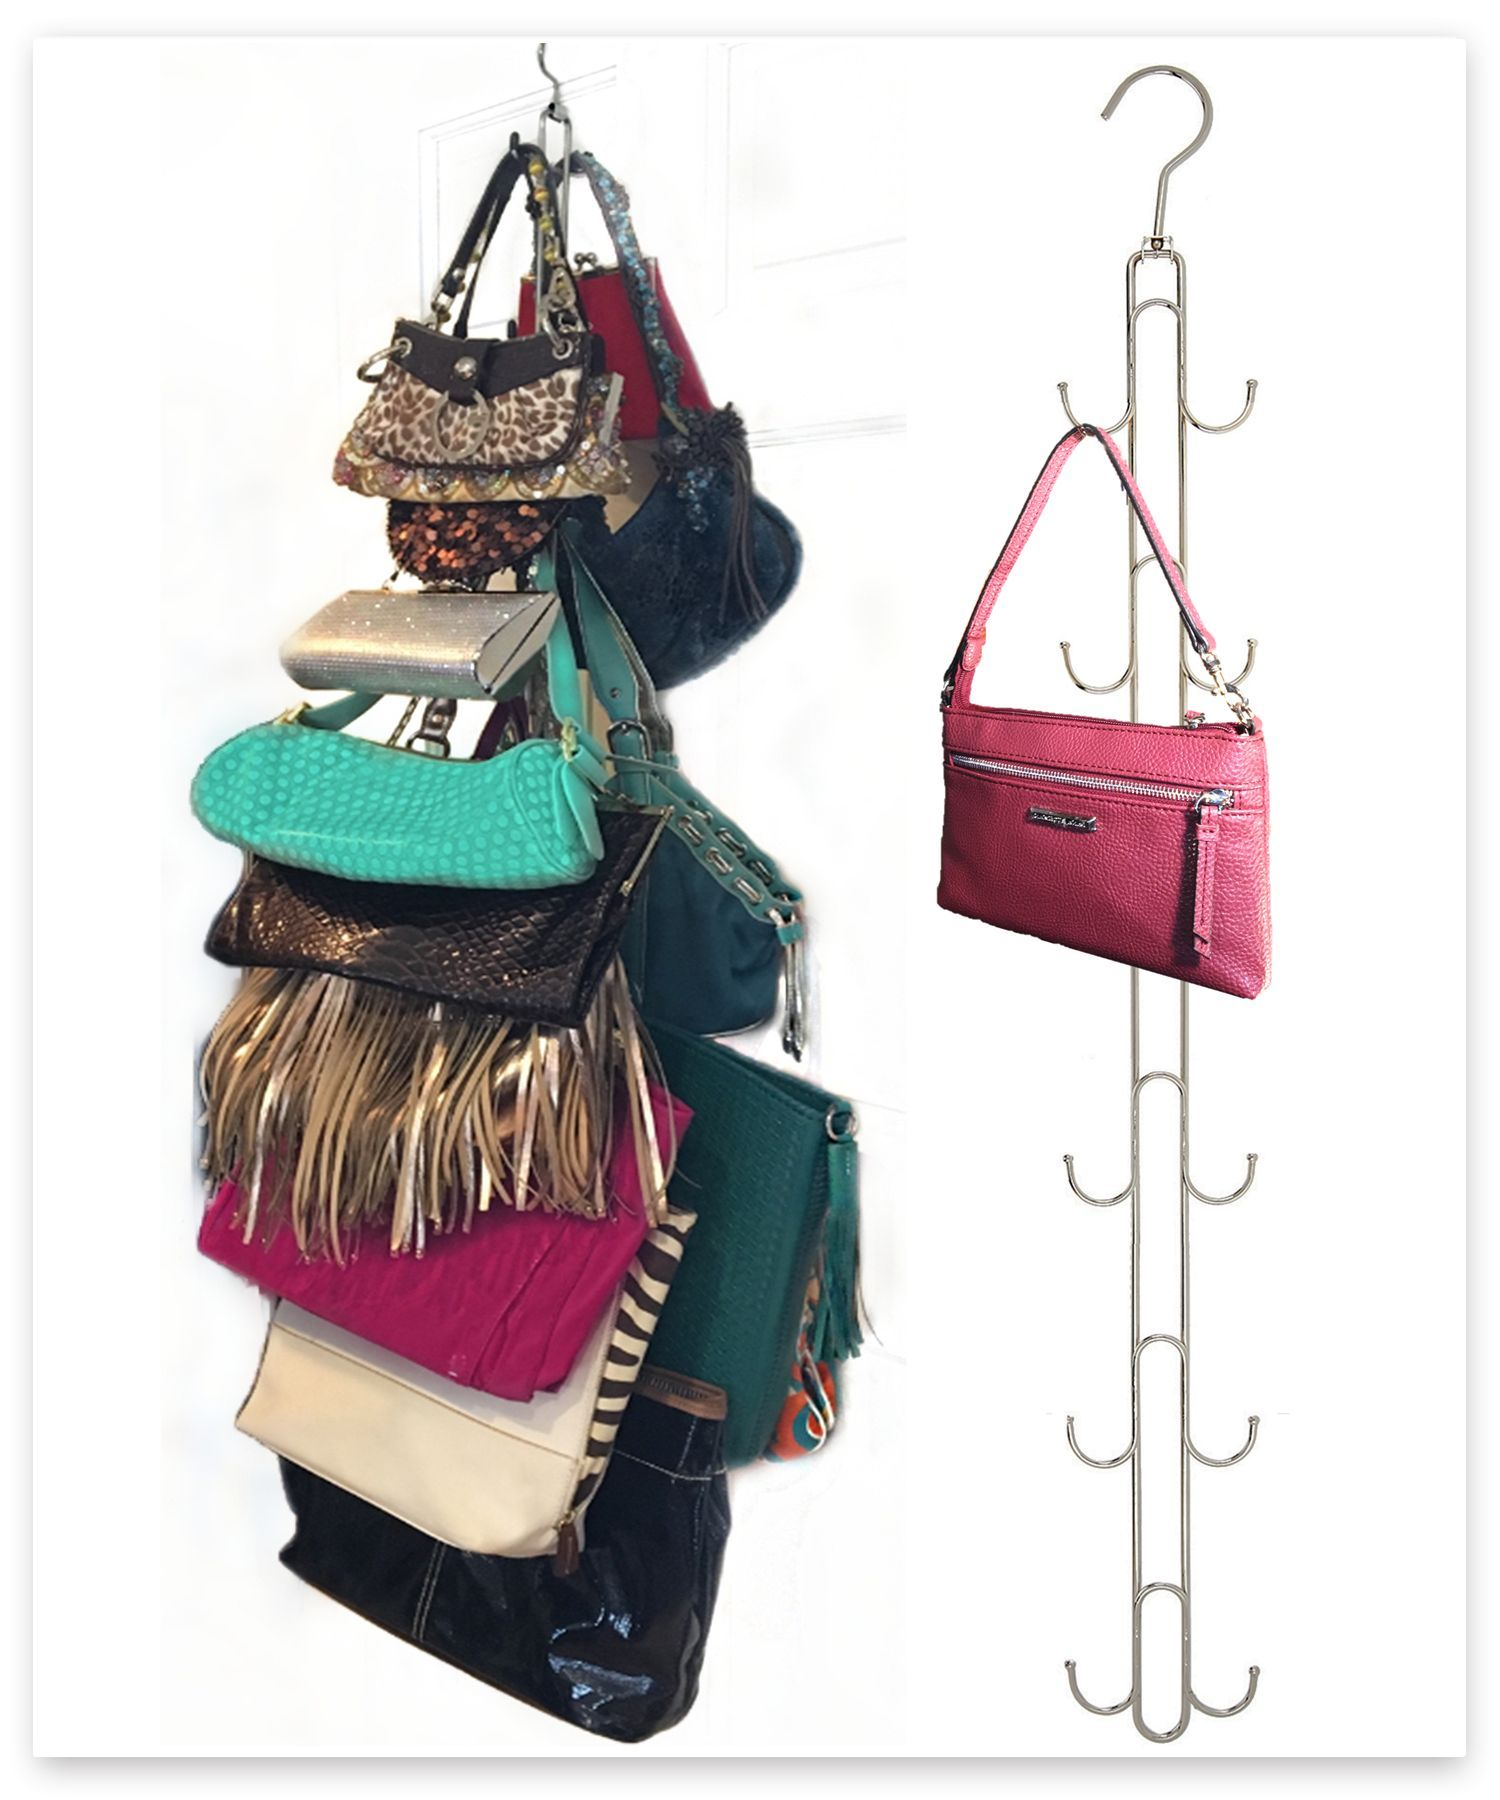 purse stax purse hanger purse and handbag vertical organizer